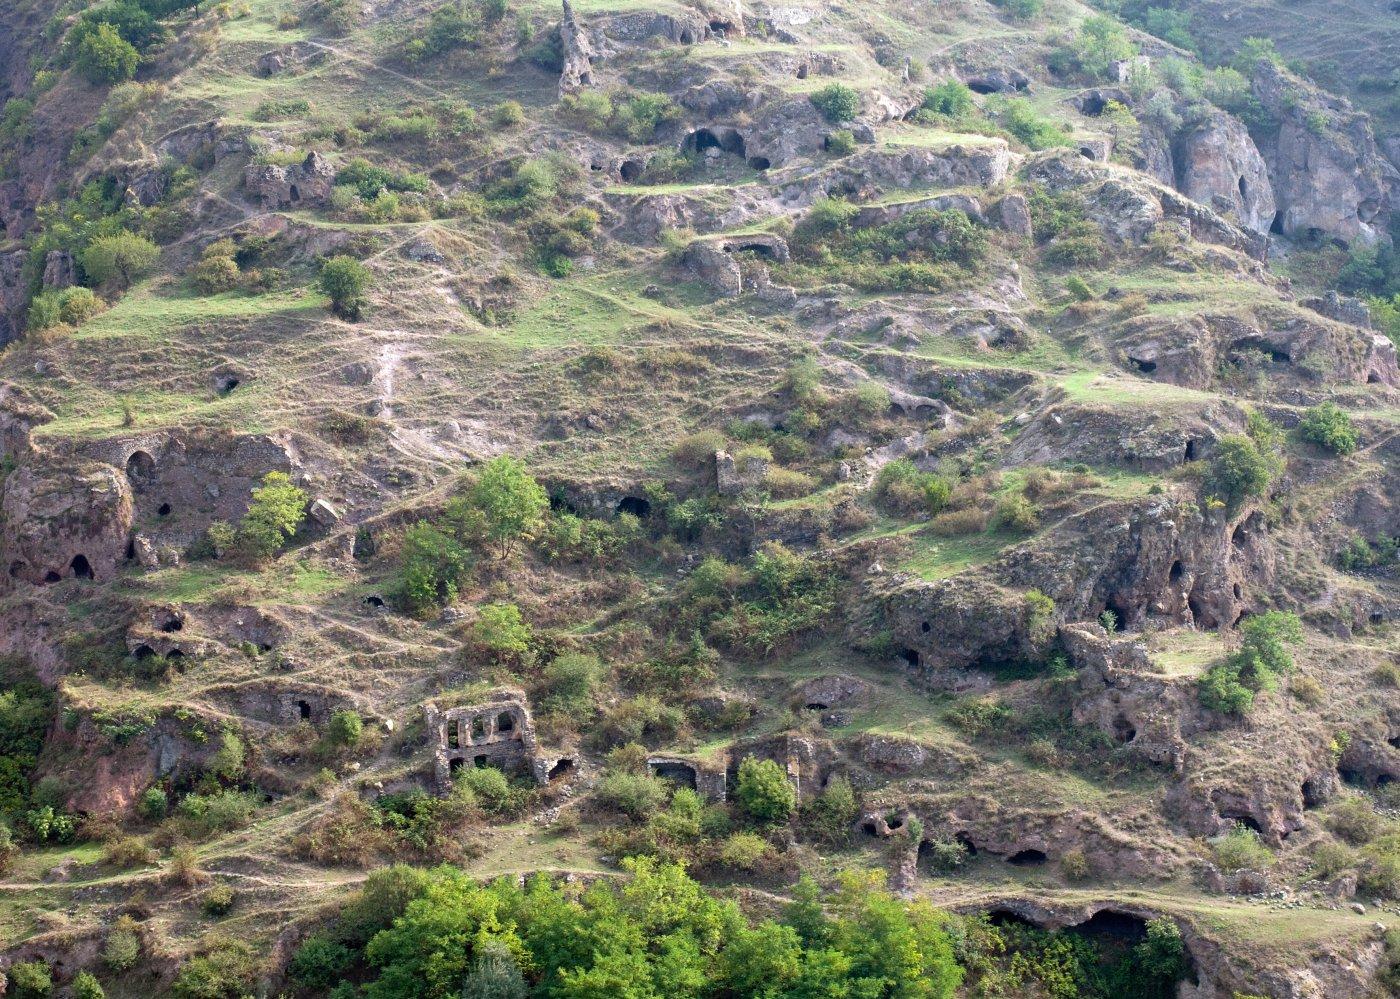 Фото Хндзореск. Армения, Сюник, Goris-Berdzor-Stepanakert Highway